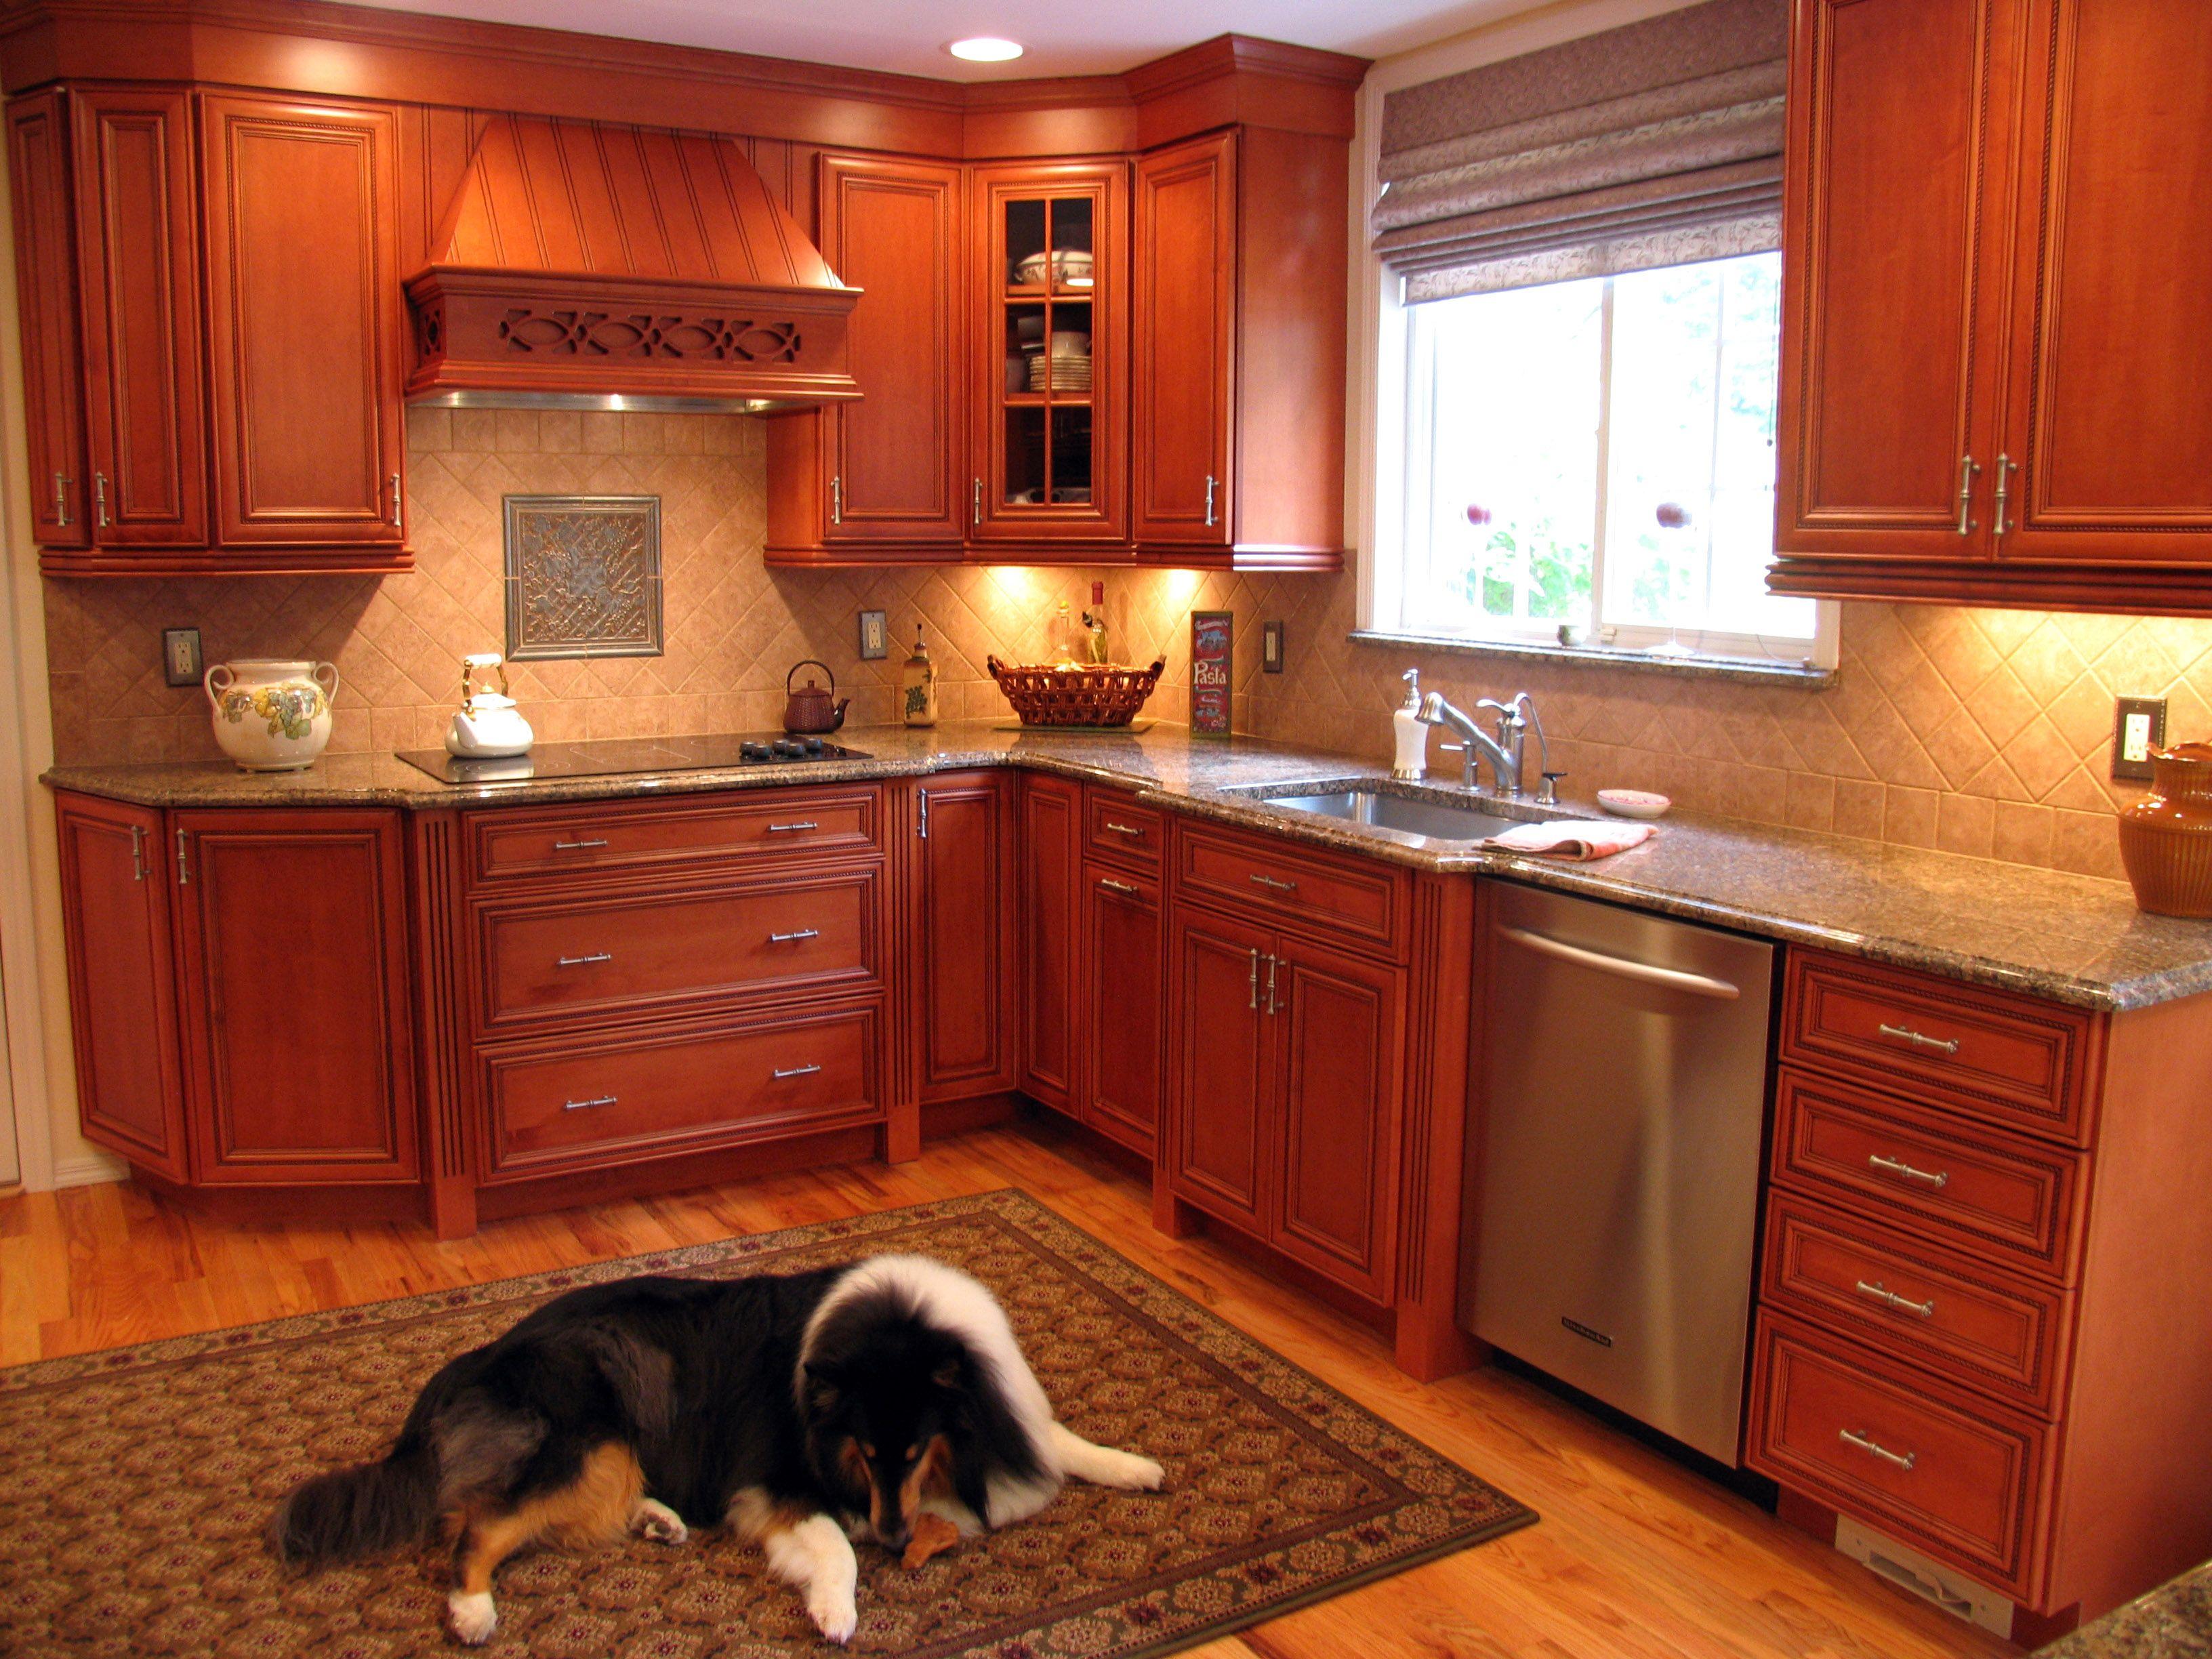 Kitchen Remodeling Photos Alure Home Improvements Kitchen Gallery Maple Kitchen Cabinets Kitchen Layout